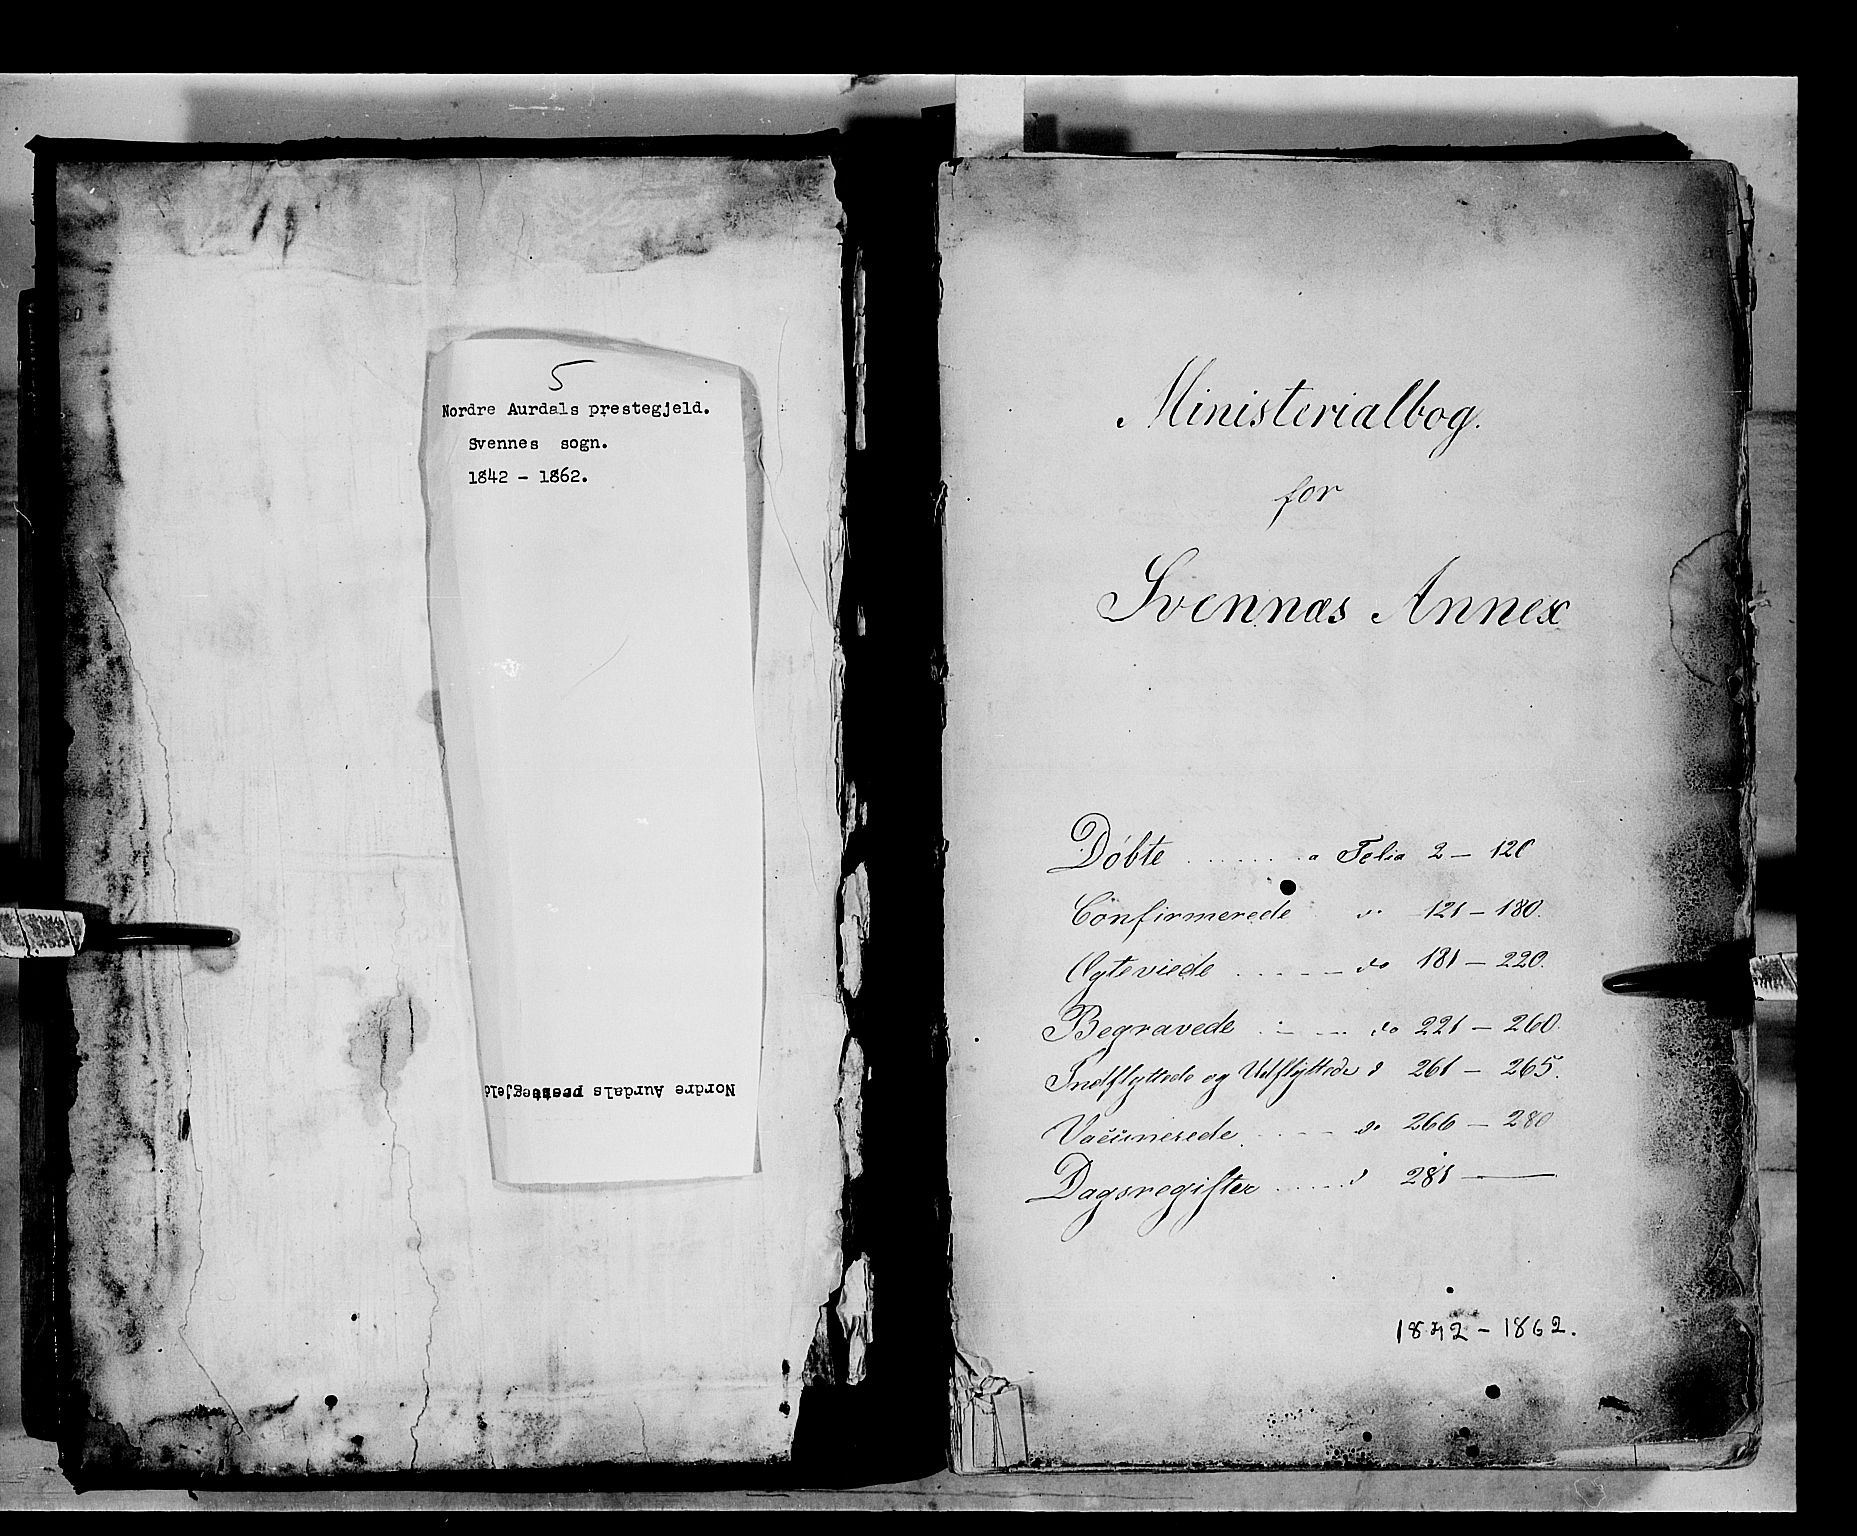 SAH, Nord-Aurdal prestekontor, Ministerialbok nr. 5, 1842-1863